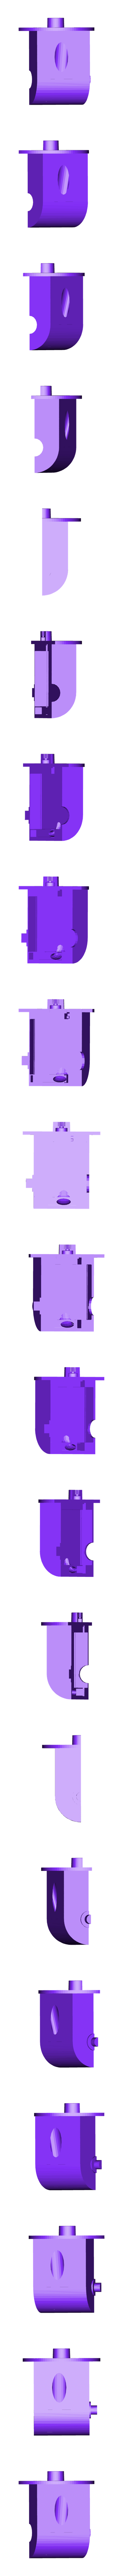 gadgets neck back.stl Download free STL file GADGET the robotic Gremlin • 3D printing object, atarka3